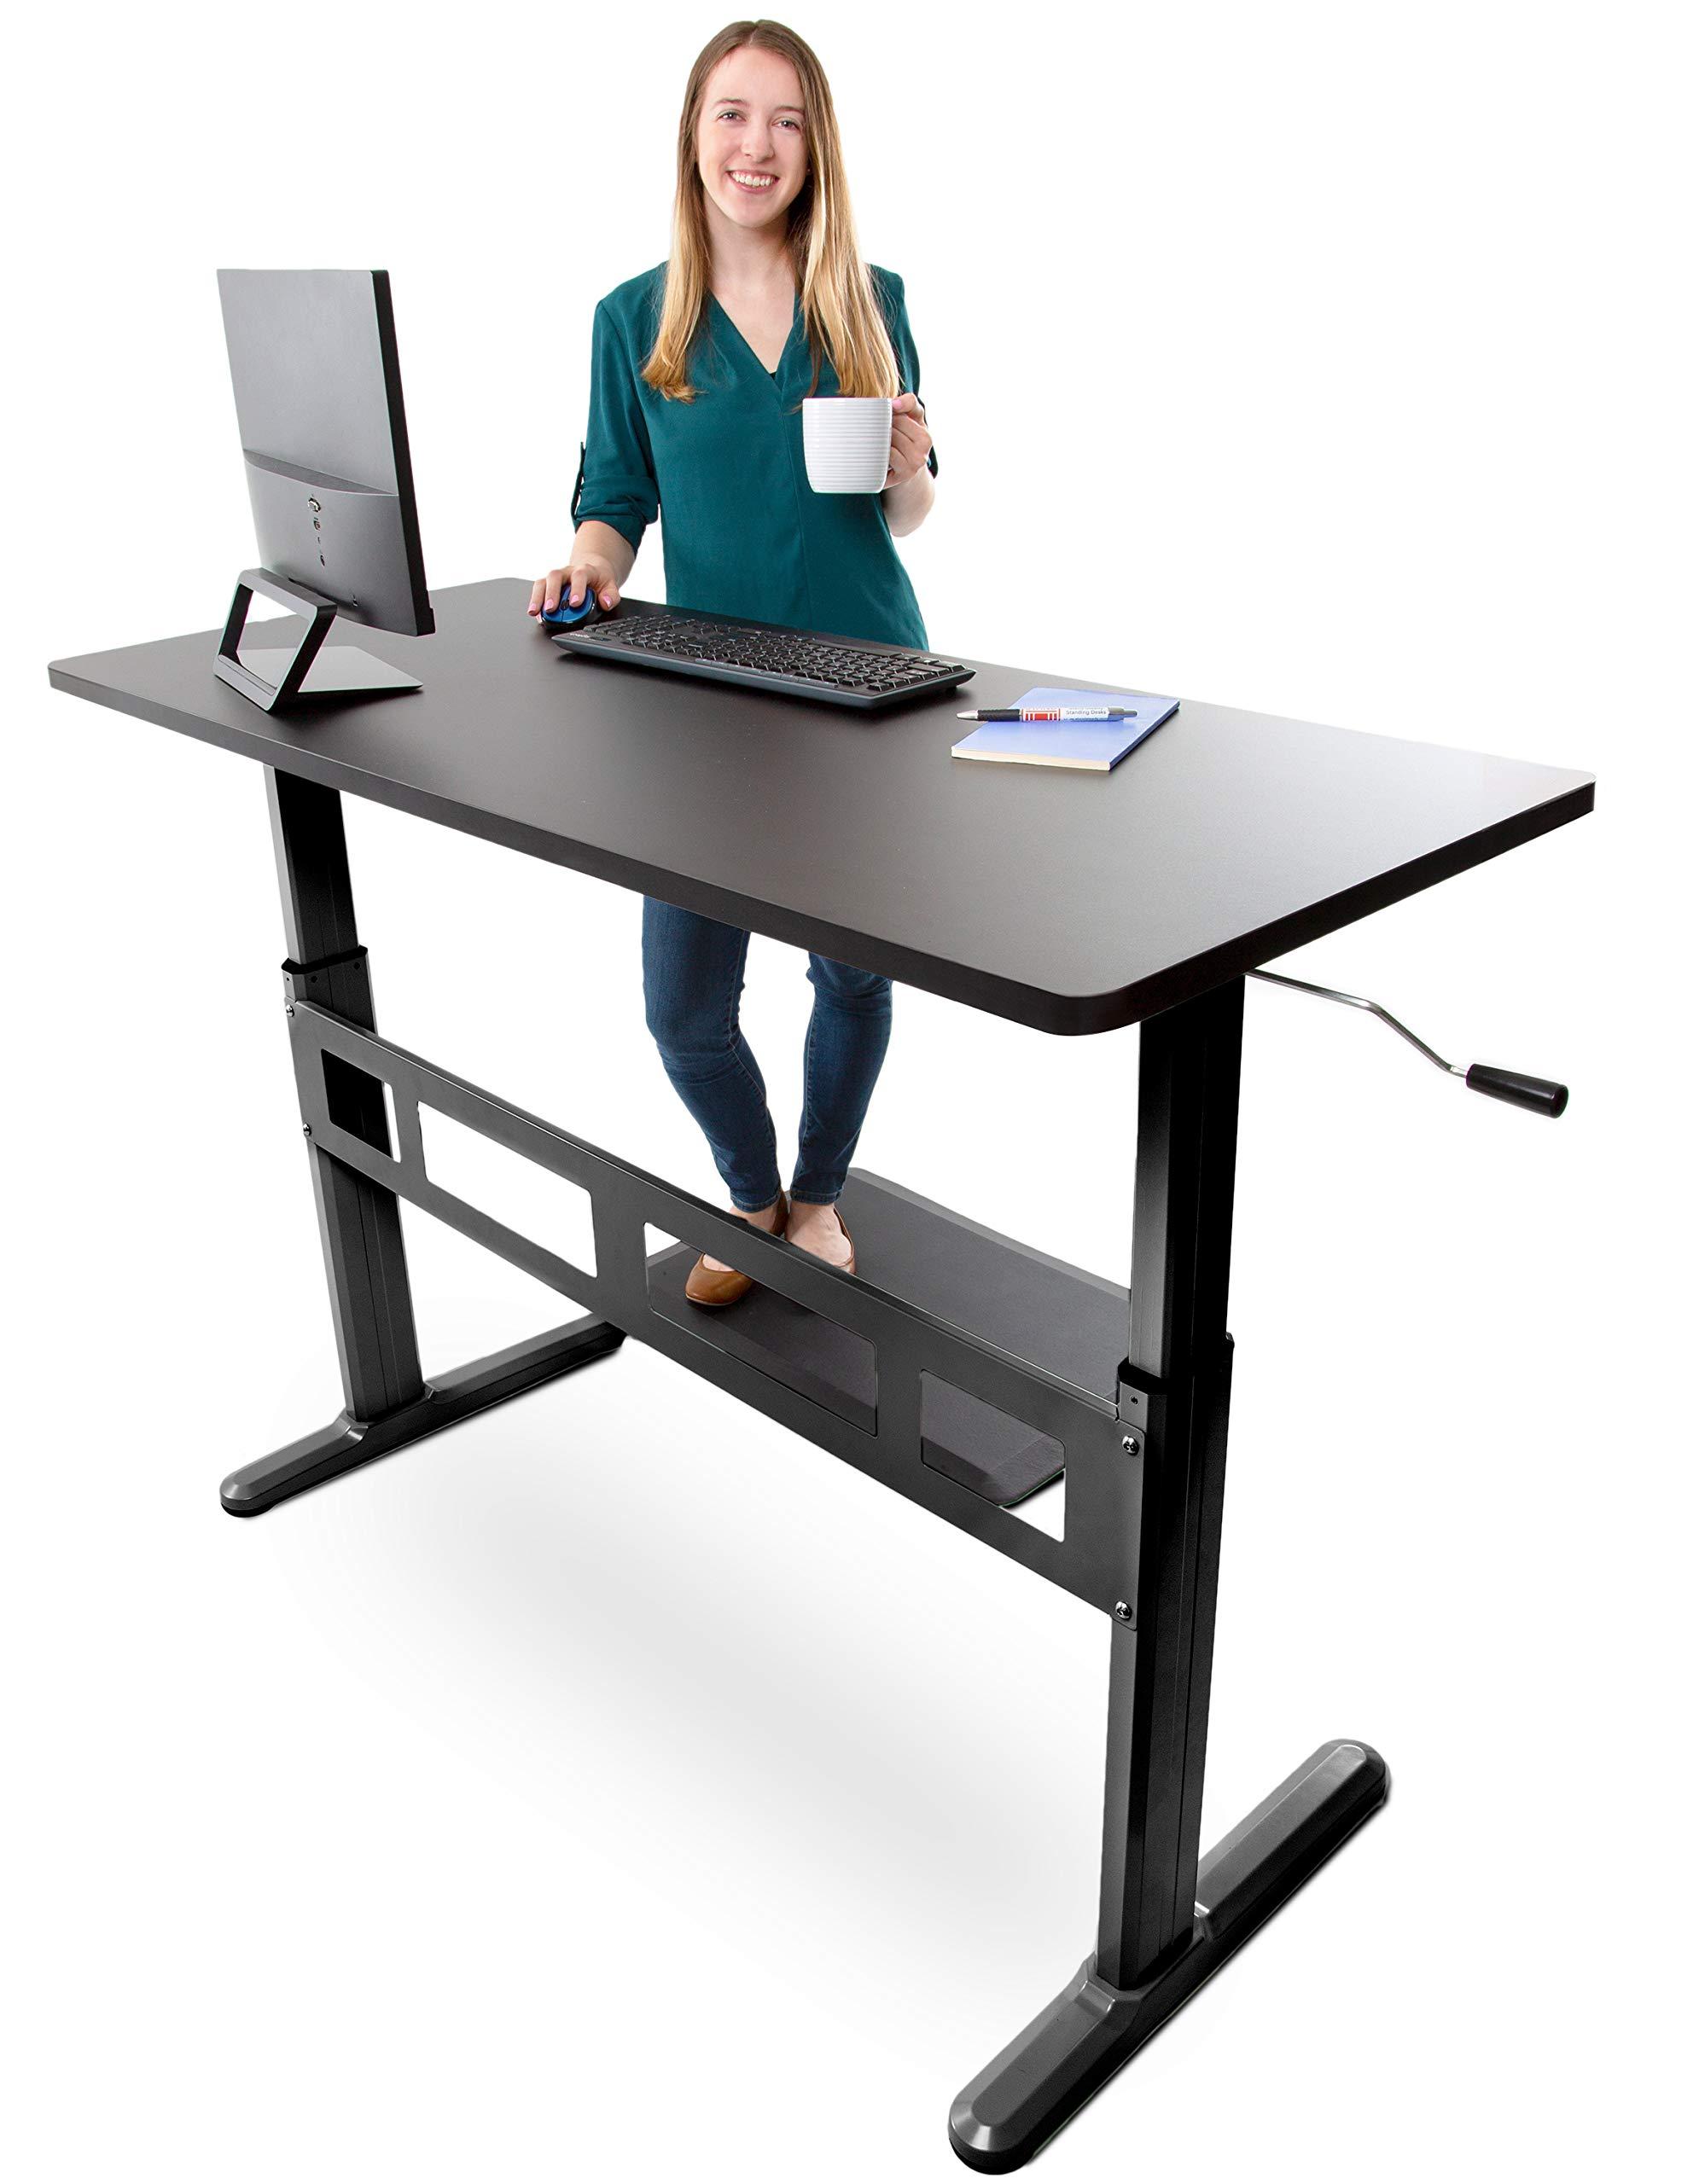 Tranzendesk Standing Desk by Stand Steady | 55 inch Crank Adjustable Stand Up Workstation (Black Top, Black Frame)